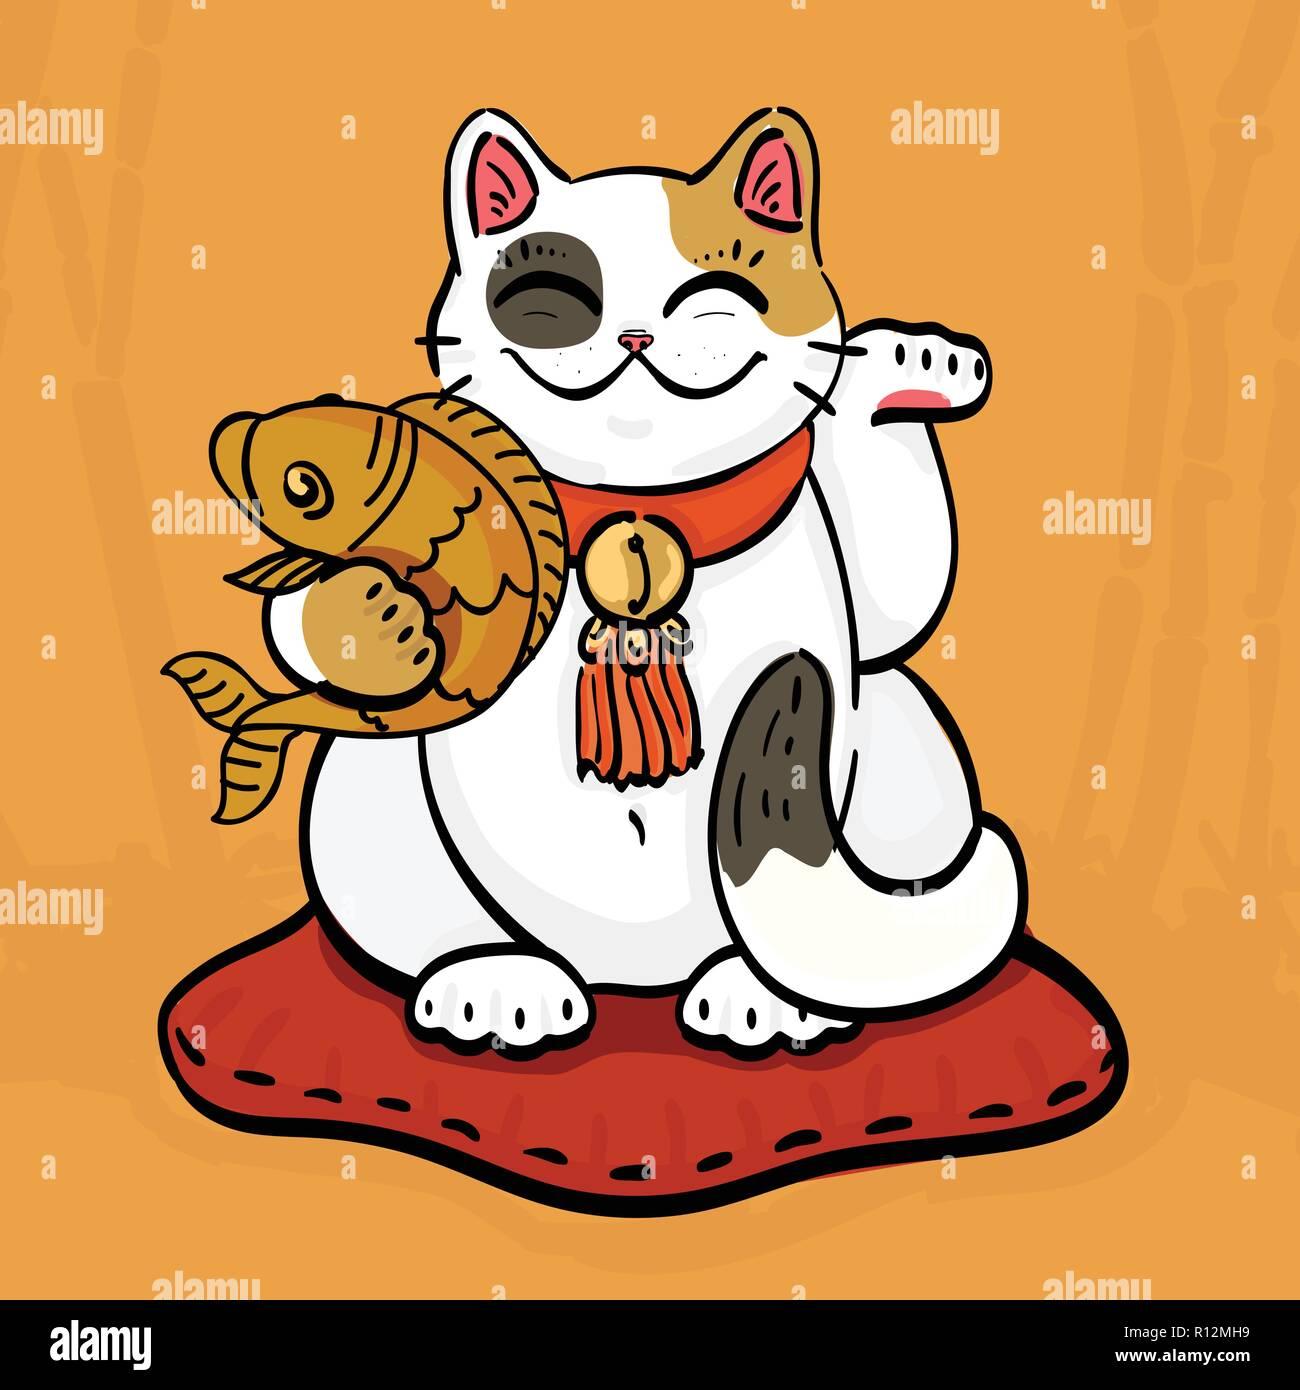 Illustration De Maneki Neko Chat Talisman Signe Richesse